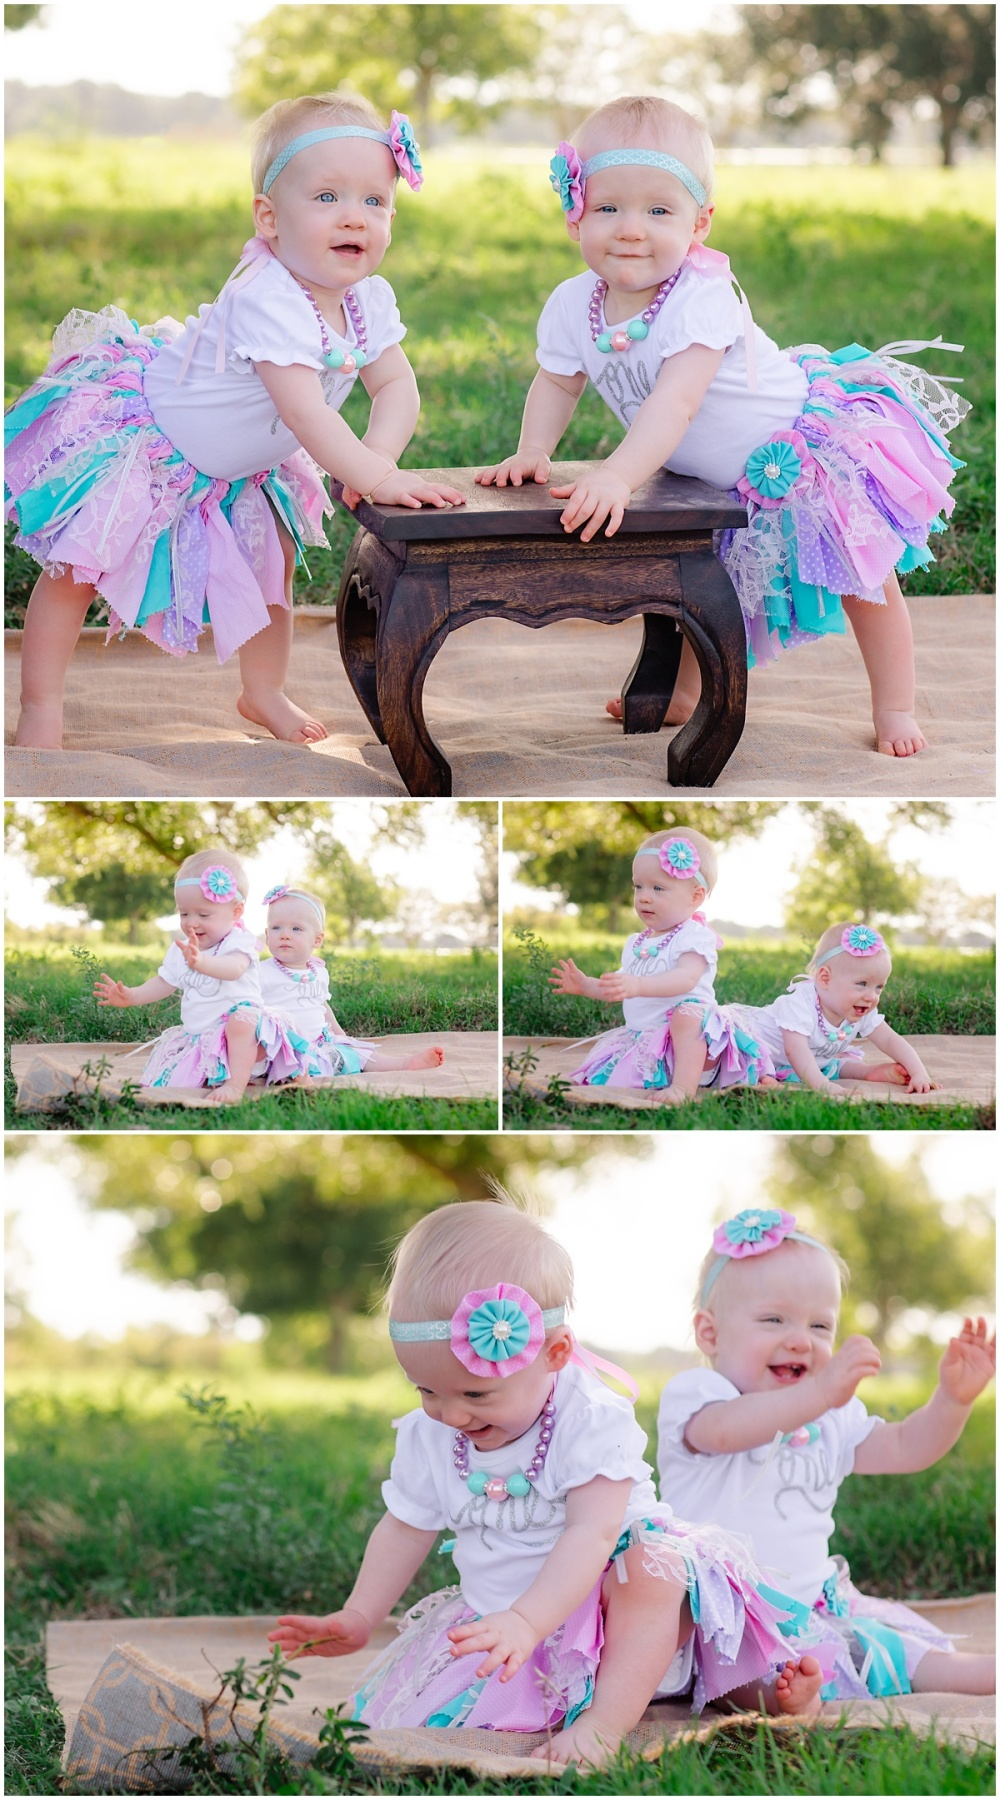 Family-Children-Portraits-Cake-Smash-Photos-San-Antonio-Hill-Country-Texas-Carly-Barton-Photography_0008.jpg